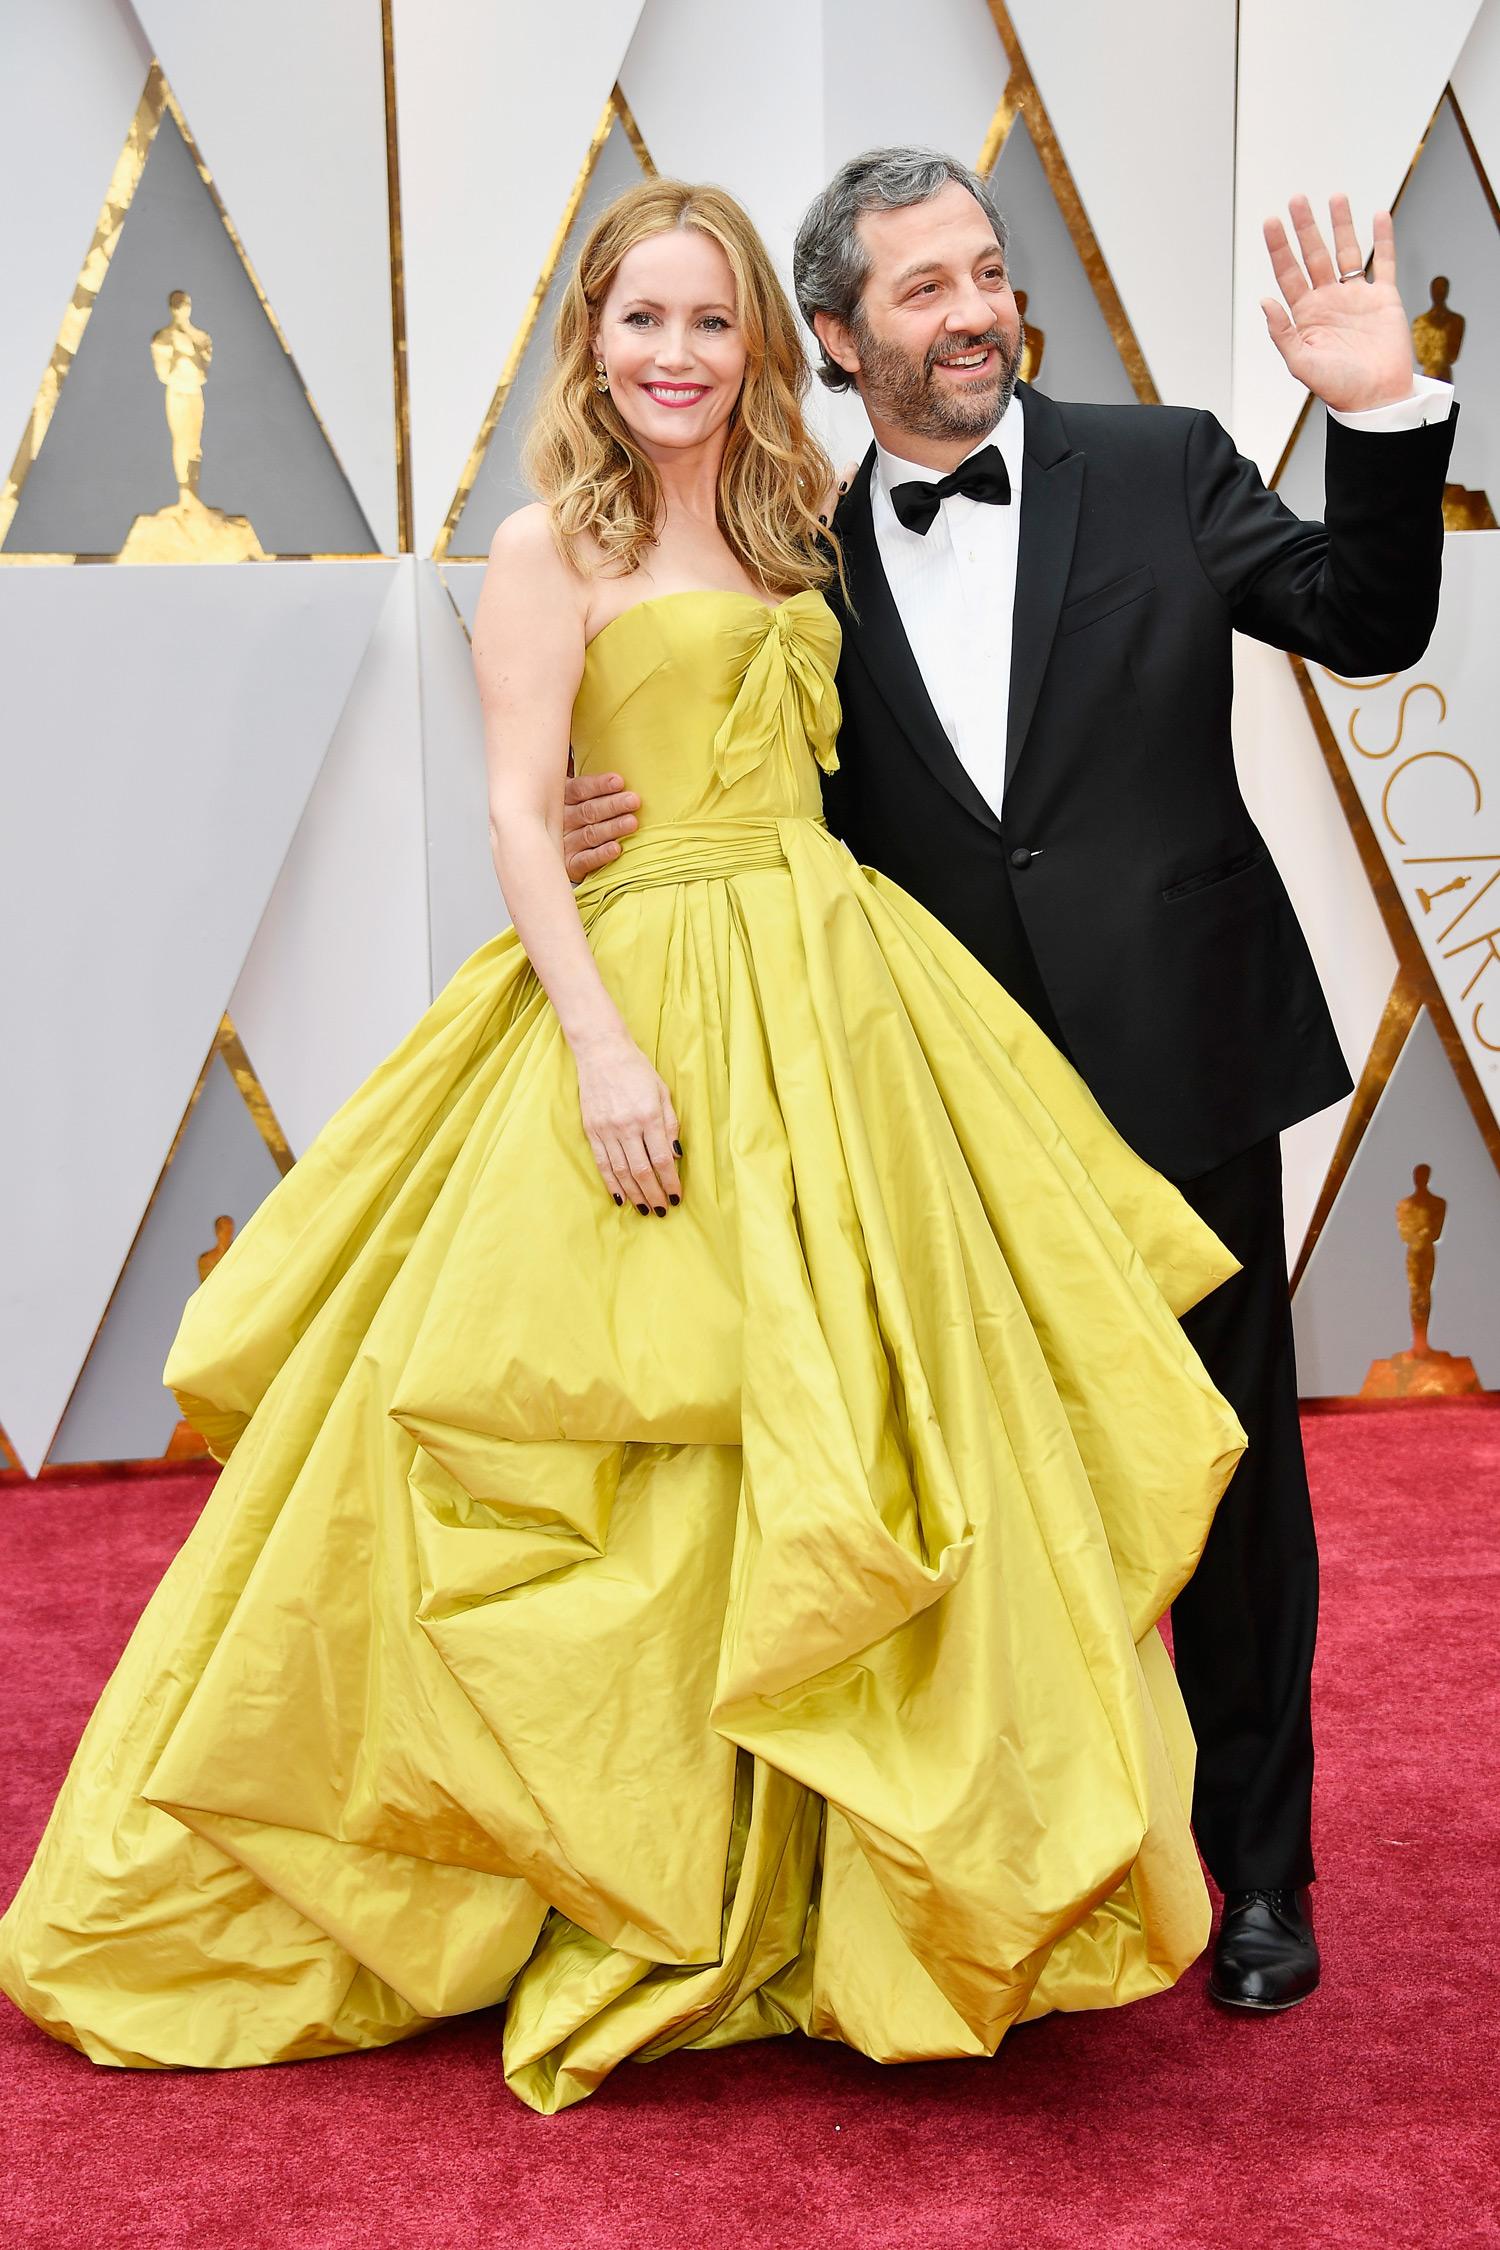 Chrissy Teigen and John Legend at 2017 Academy Awards